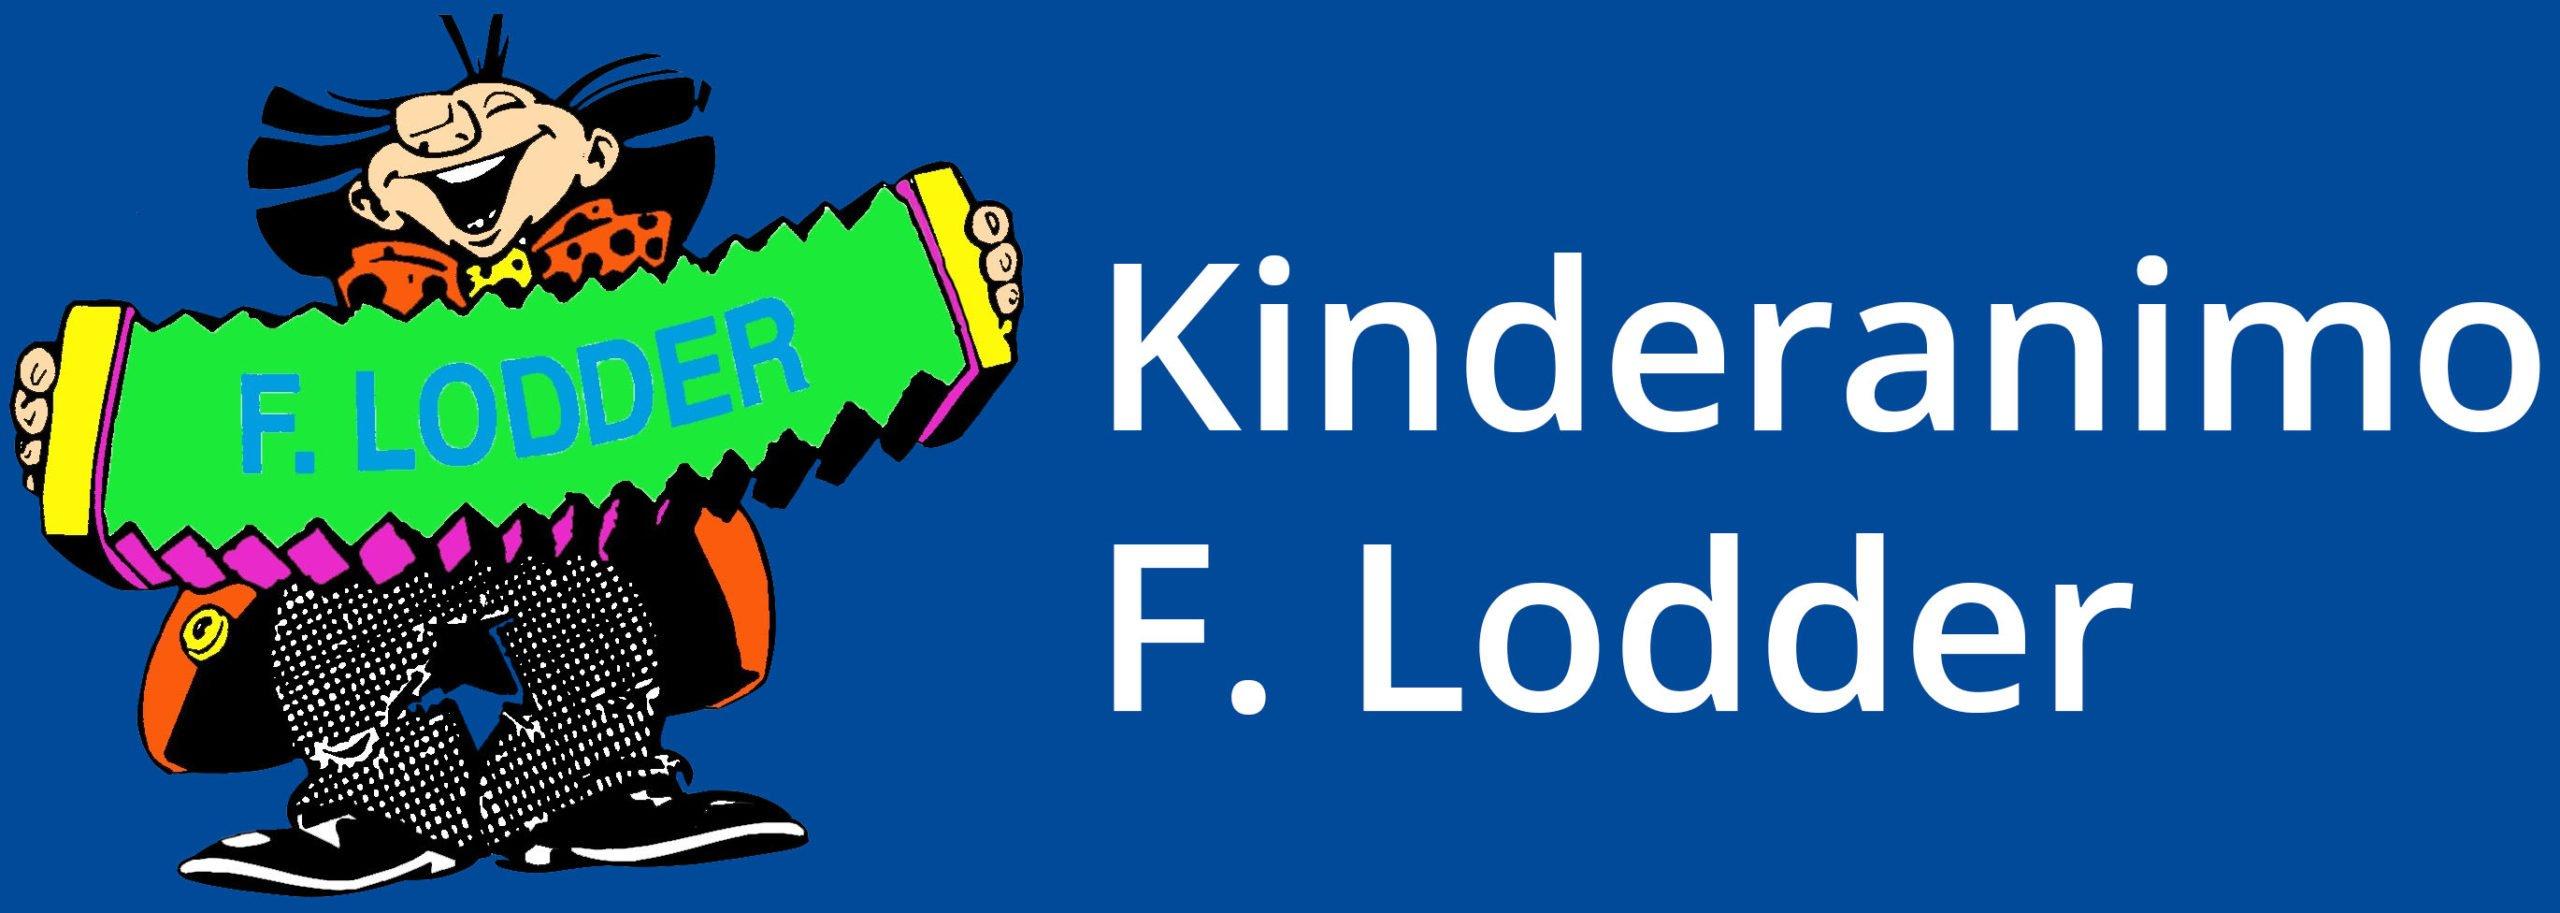 springkastelen online logo header